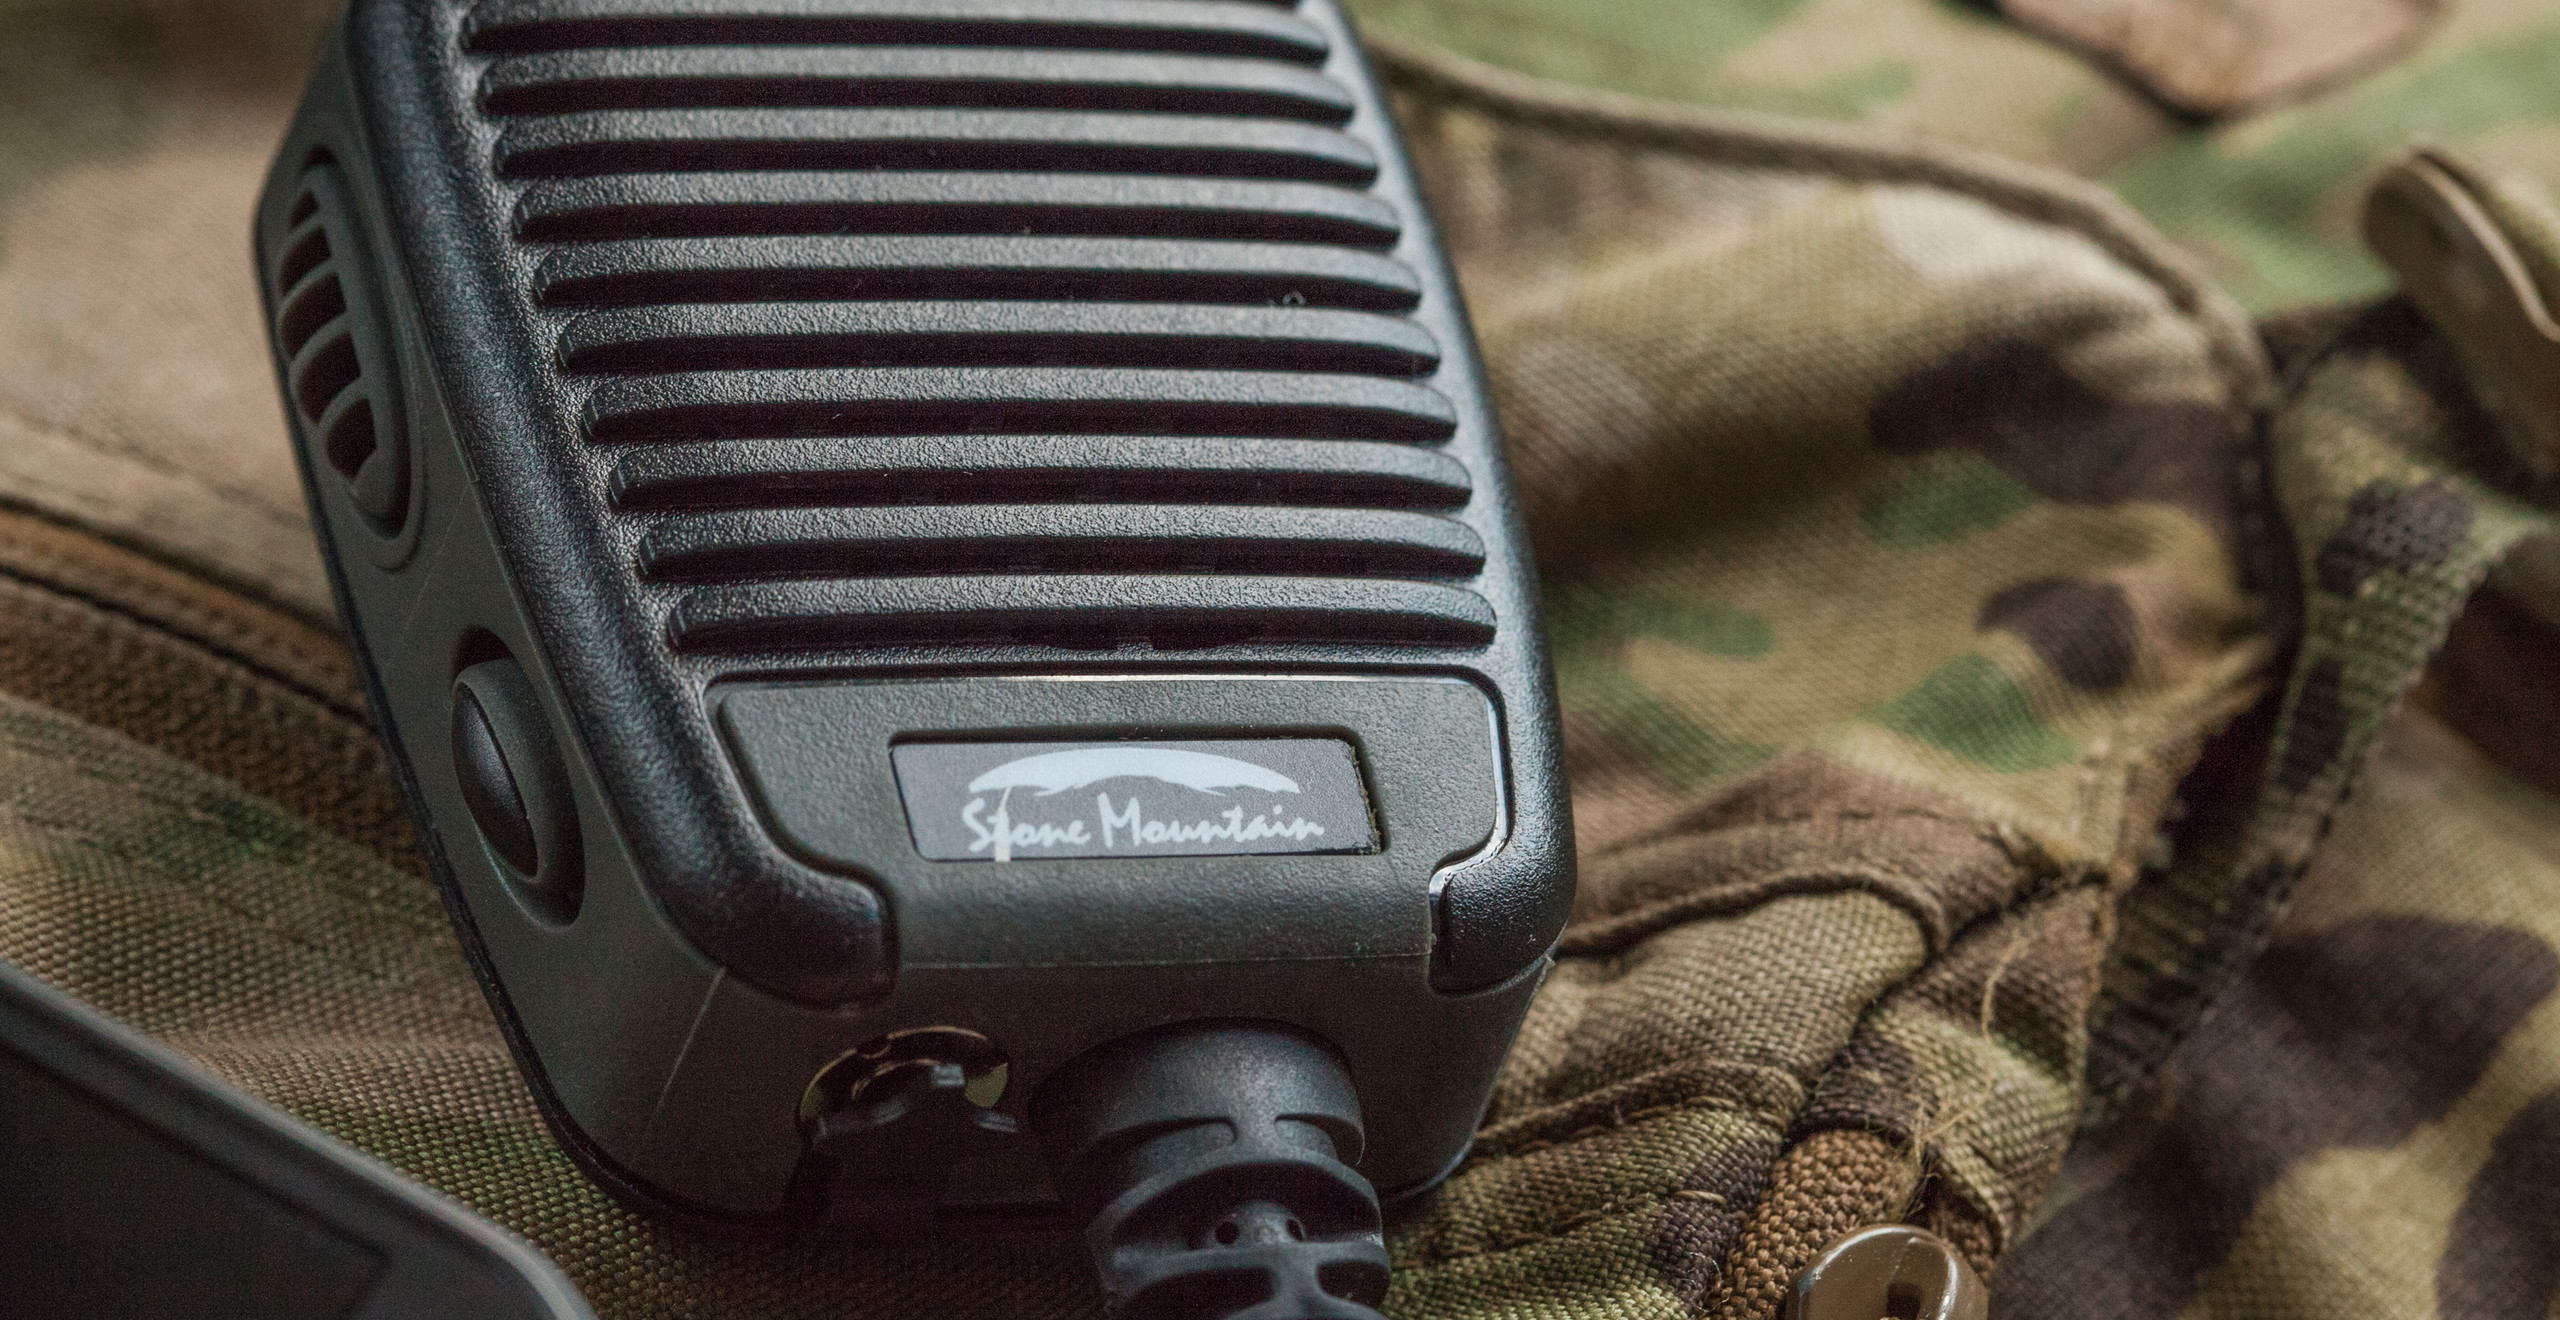 Stone Mountain Ltd Phoenix Elite PoC RSM speaker microphone Blackline simulations airsoft military simulations tactical zello accessories review Front